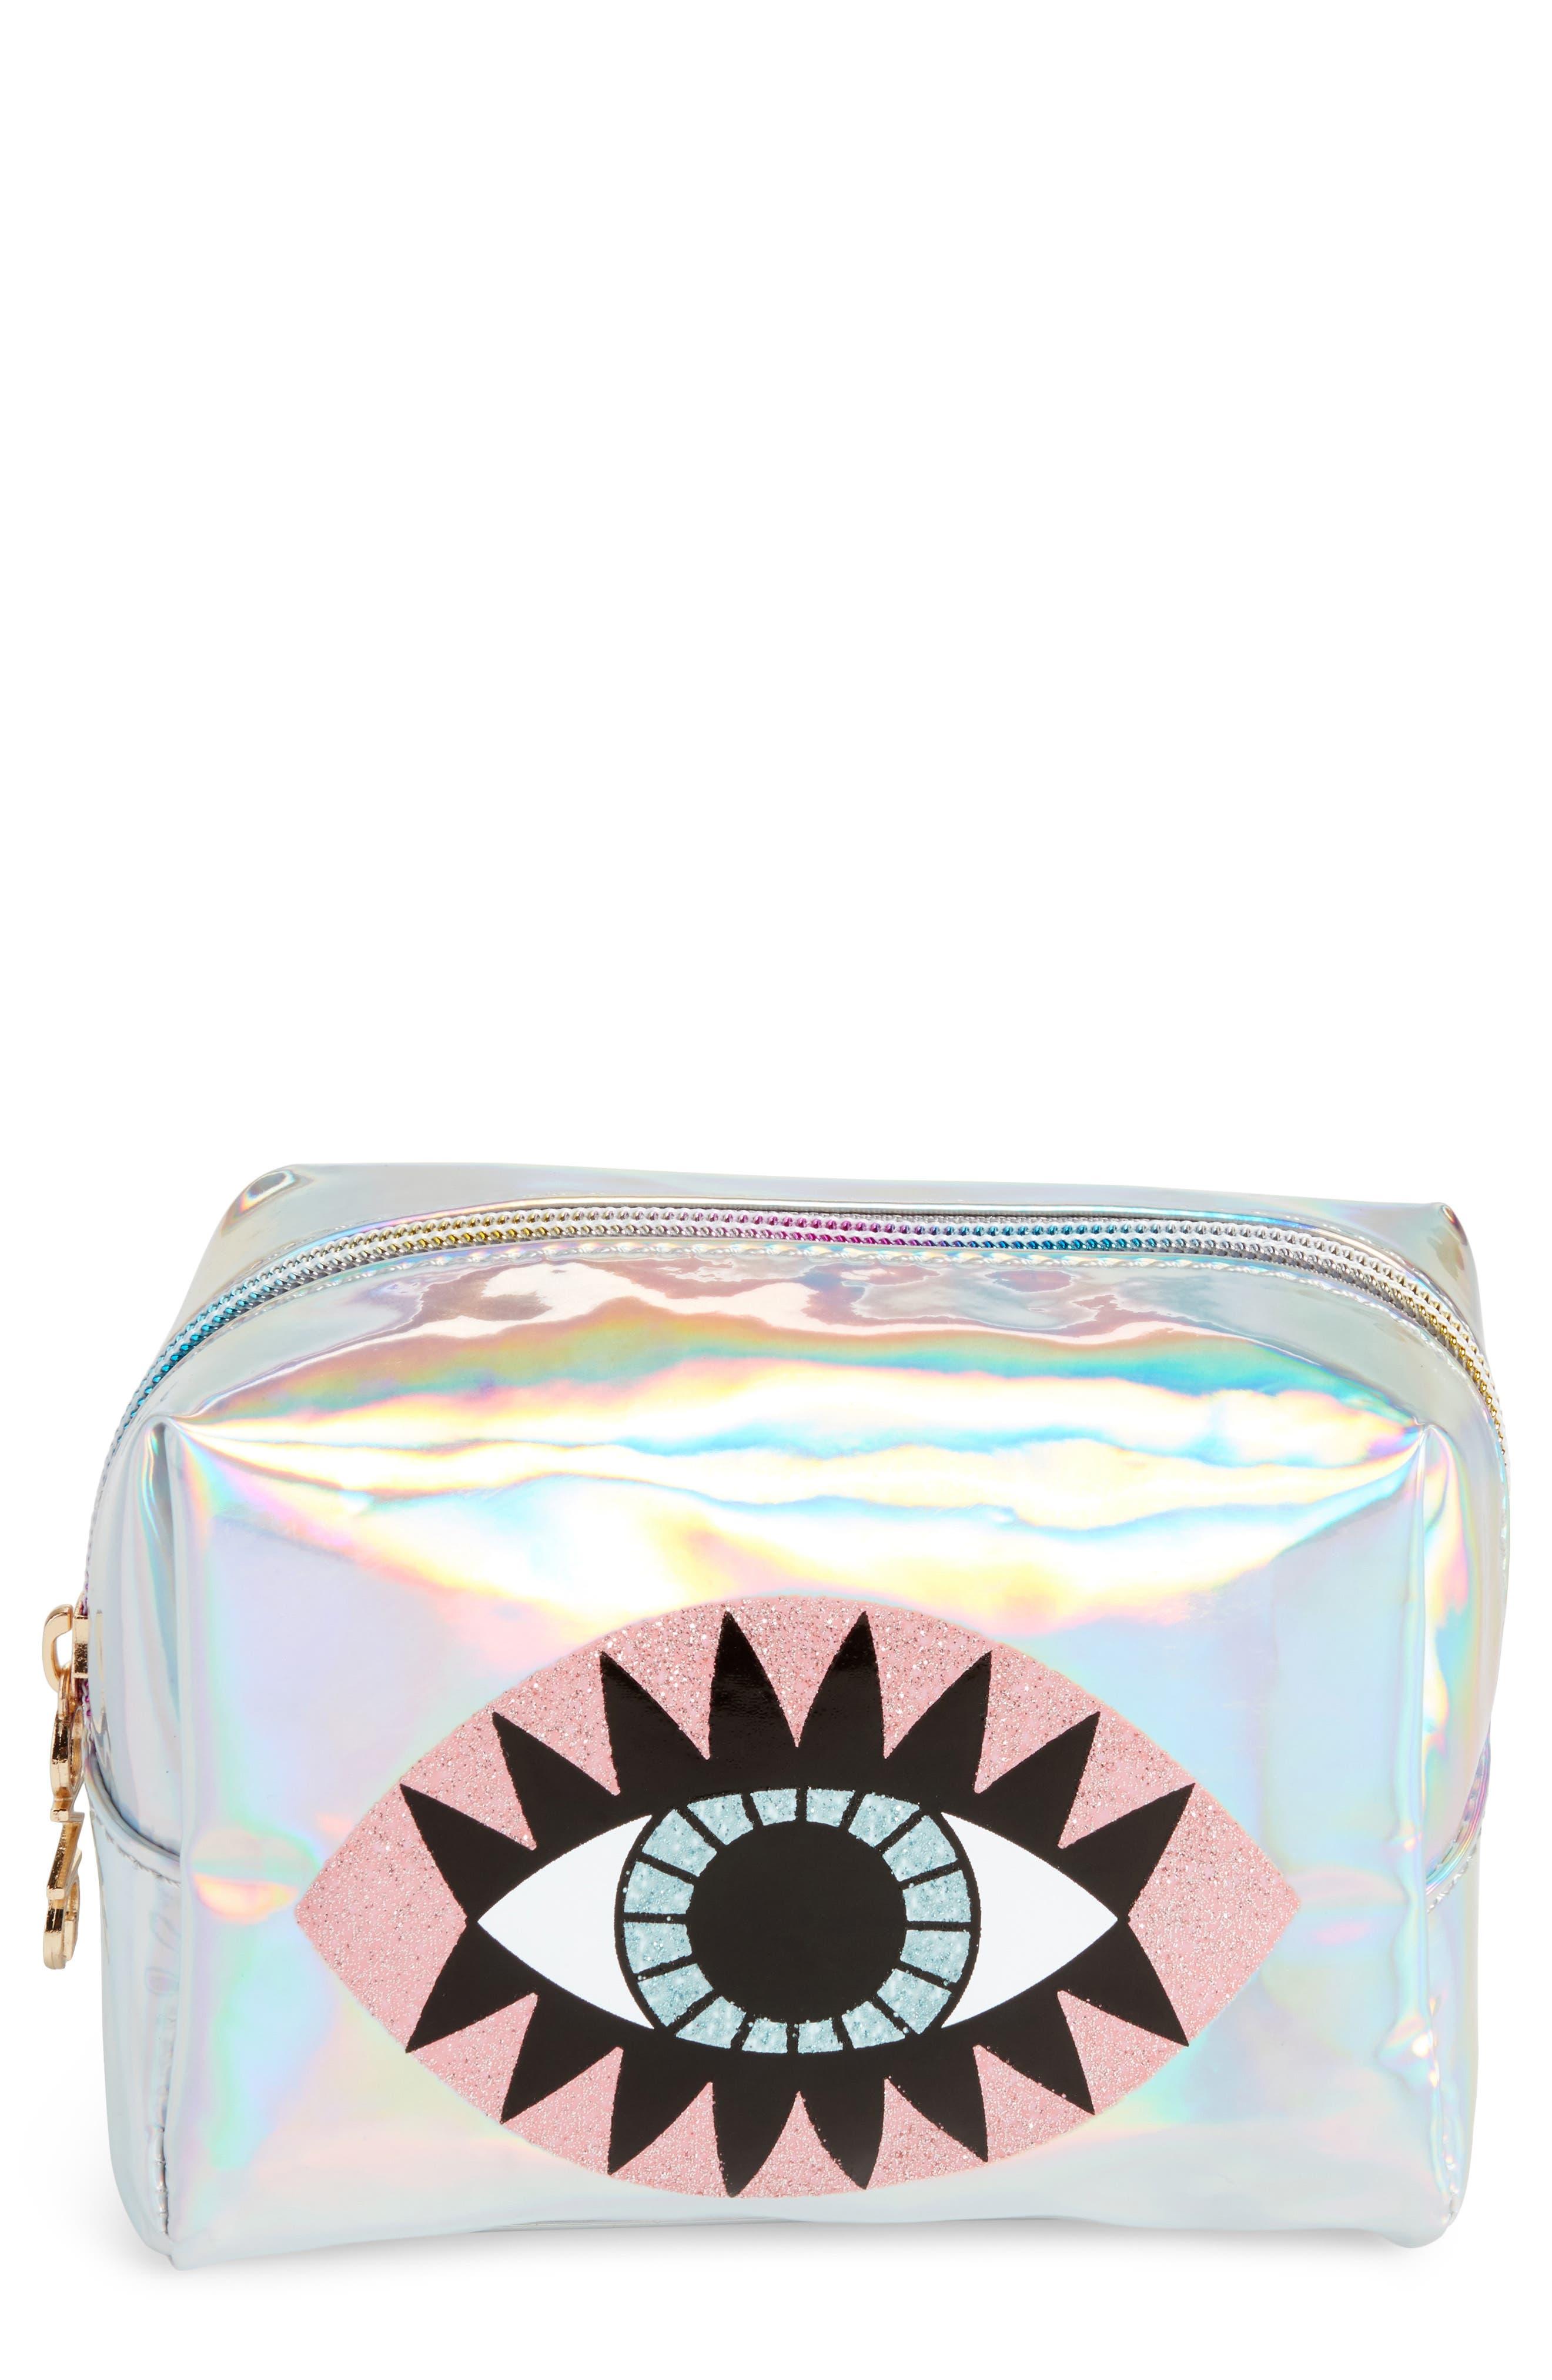 Alternate Image 1 Selected - OMG Glitter Eye Iridescent Cosmetics Bag